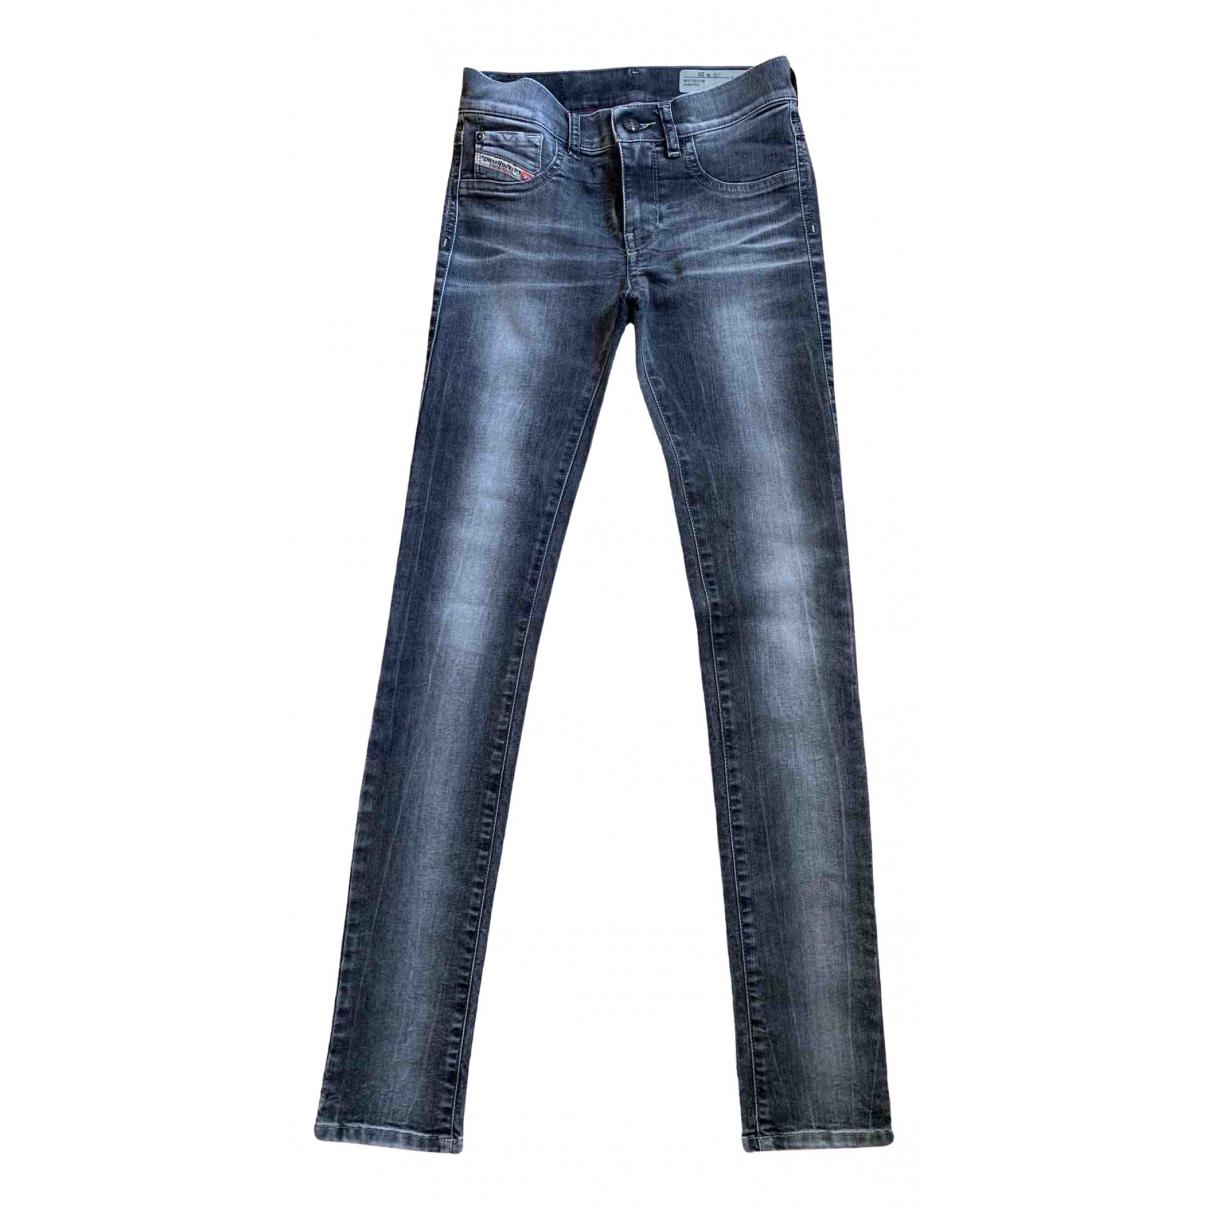 Diesel \N Grey Cotton - elasthane Jeans for Women 25 US